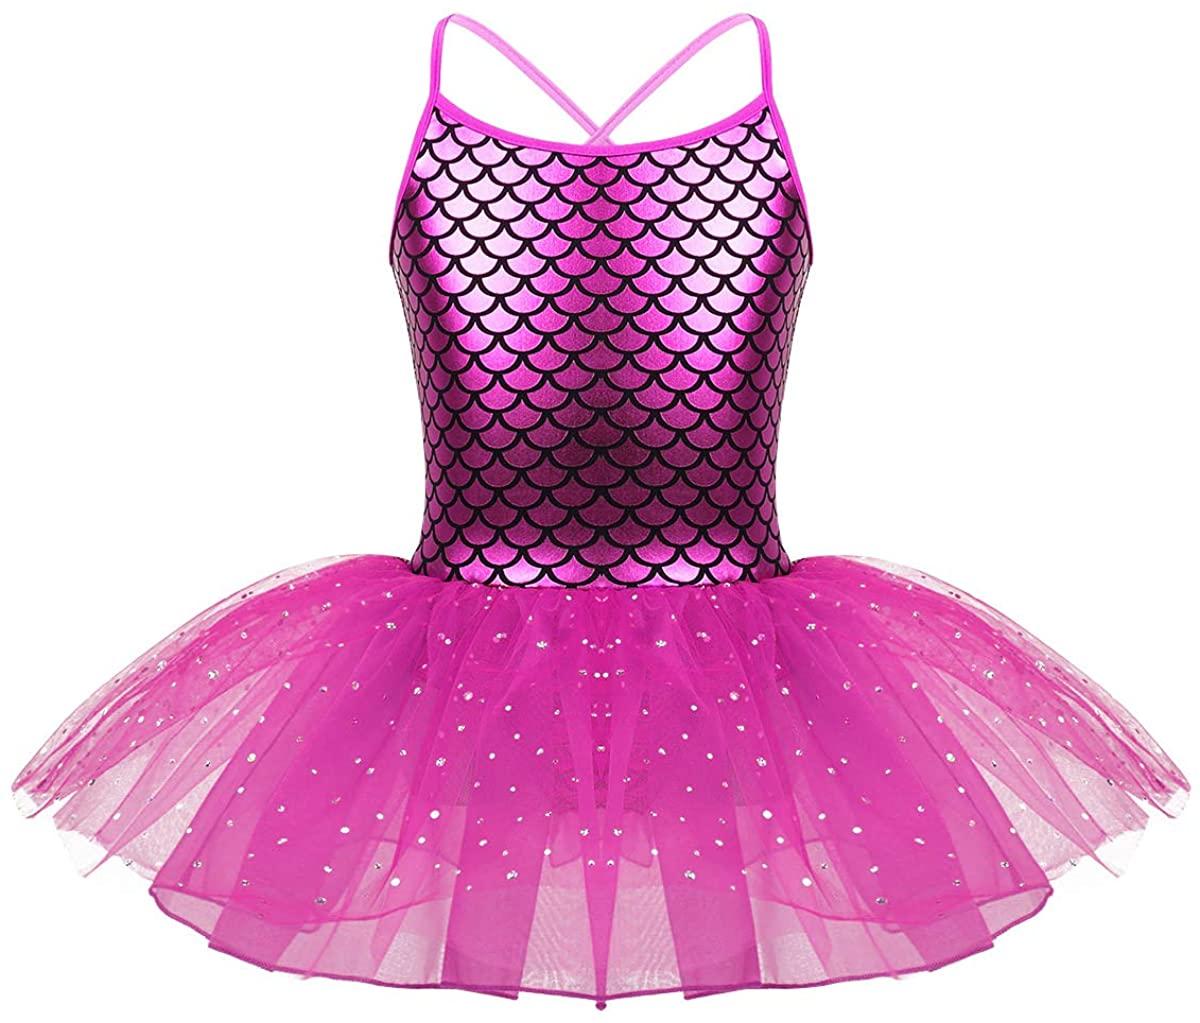 Freebily Baby Girls Fairy Princess Costume Ballerina Embroidery Ballet Leotard Dance Dress Tutus Dancewear